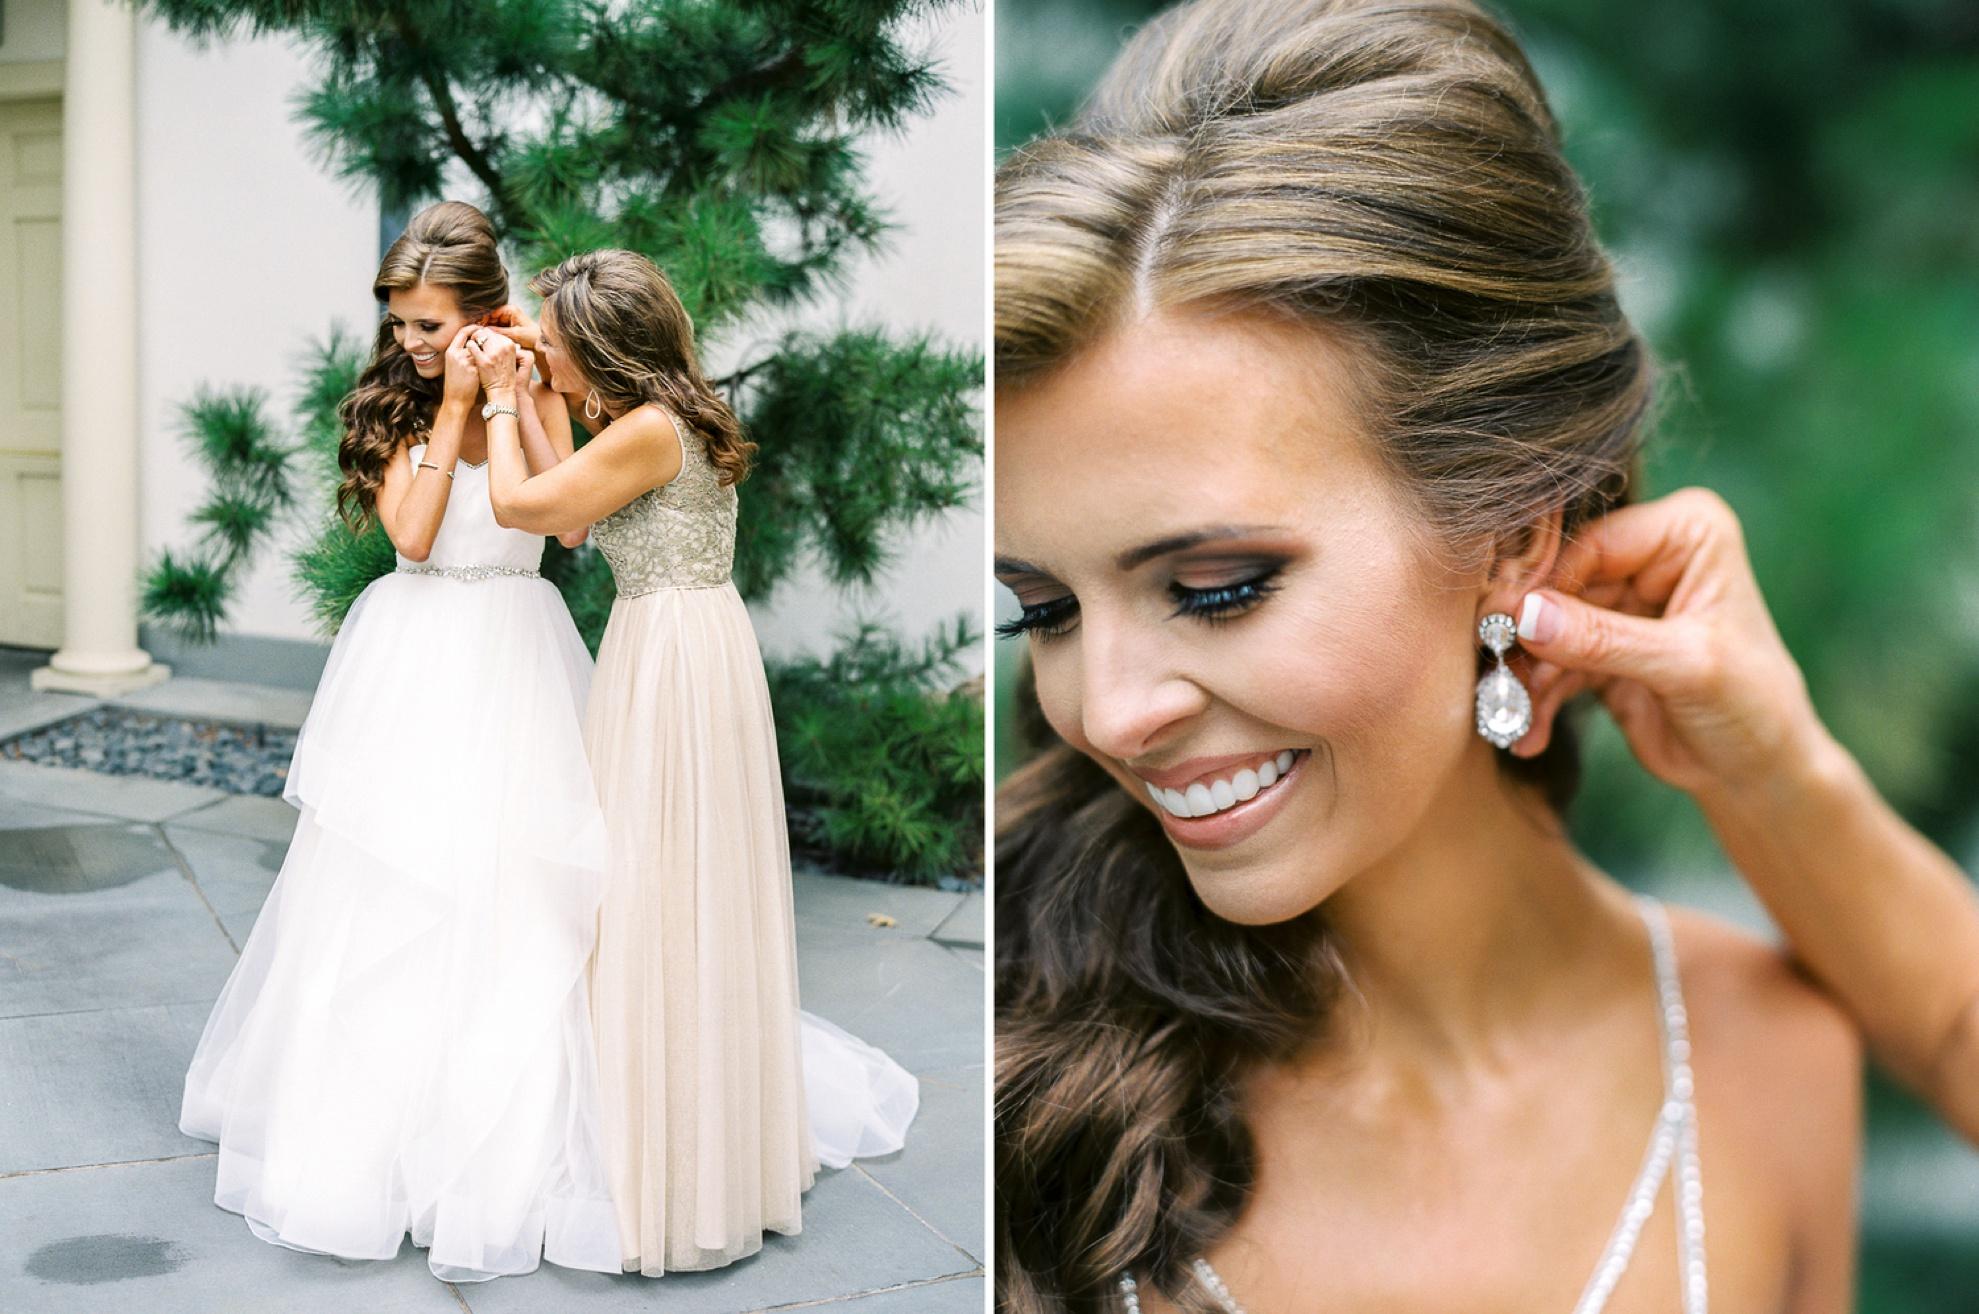 The-Junior-League-Houston-Chapter-Wedding-Reception-Dana-Fernandez-Photography-Film-Venue-3.jpg